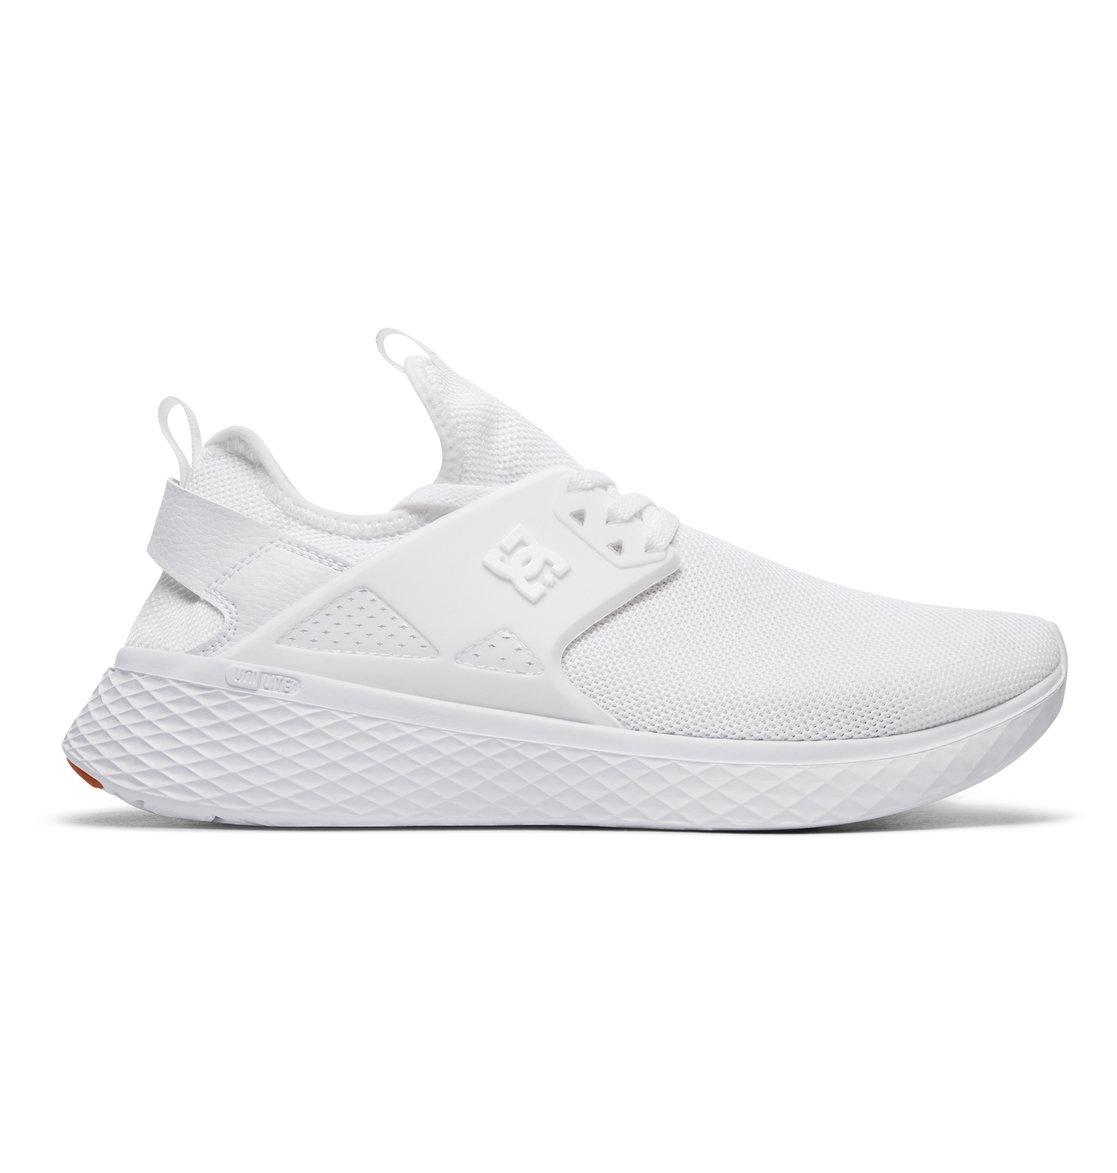 Meridian - Baskets - Gris - DC Shoes G12seg